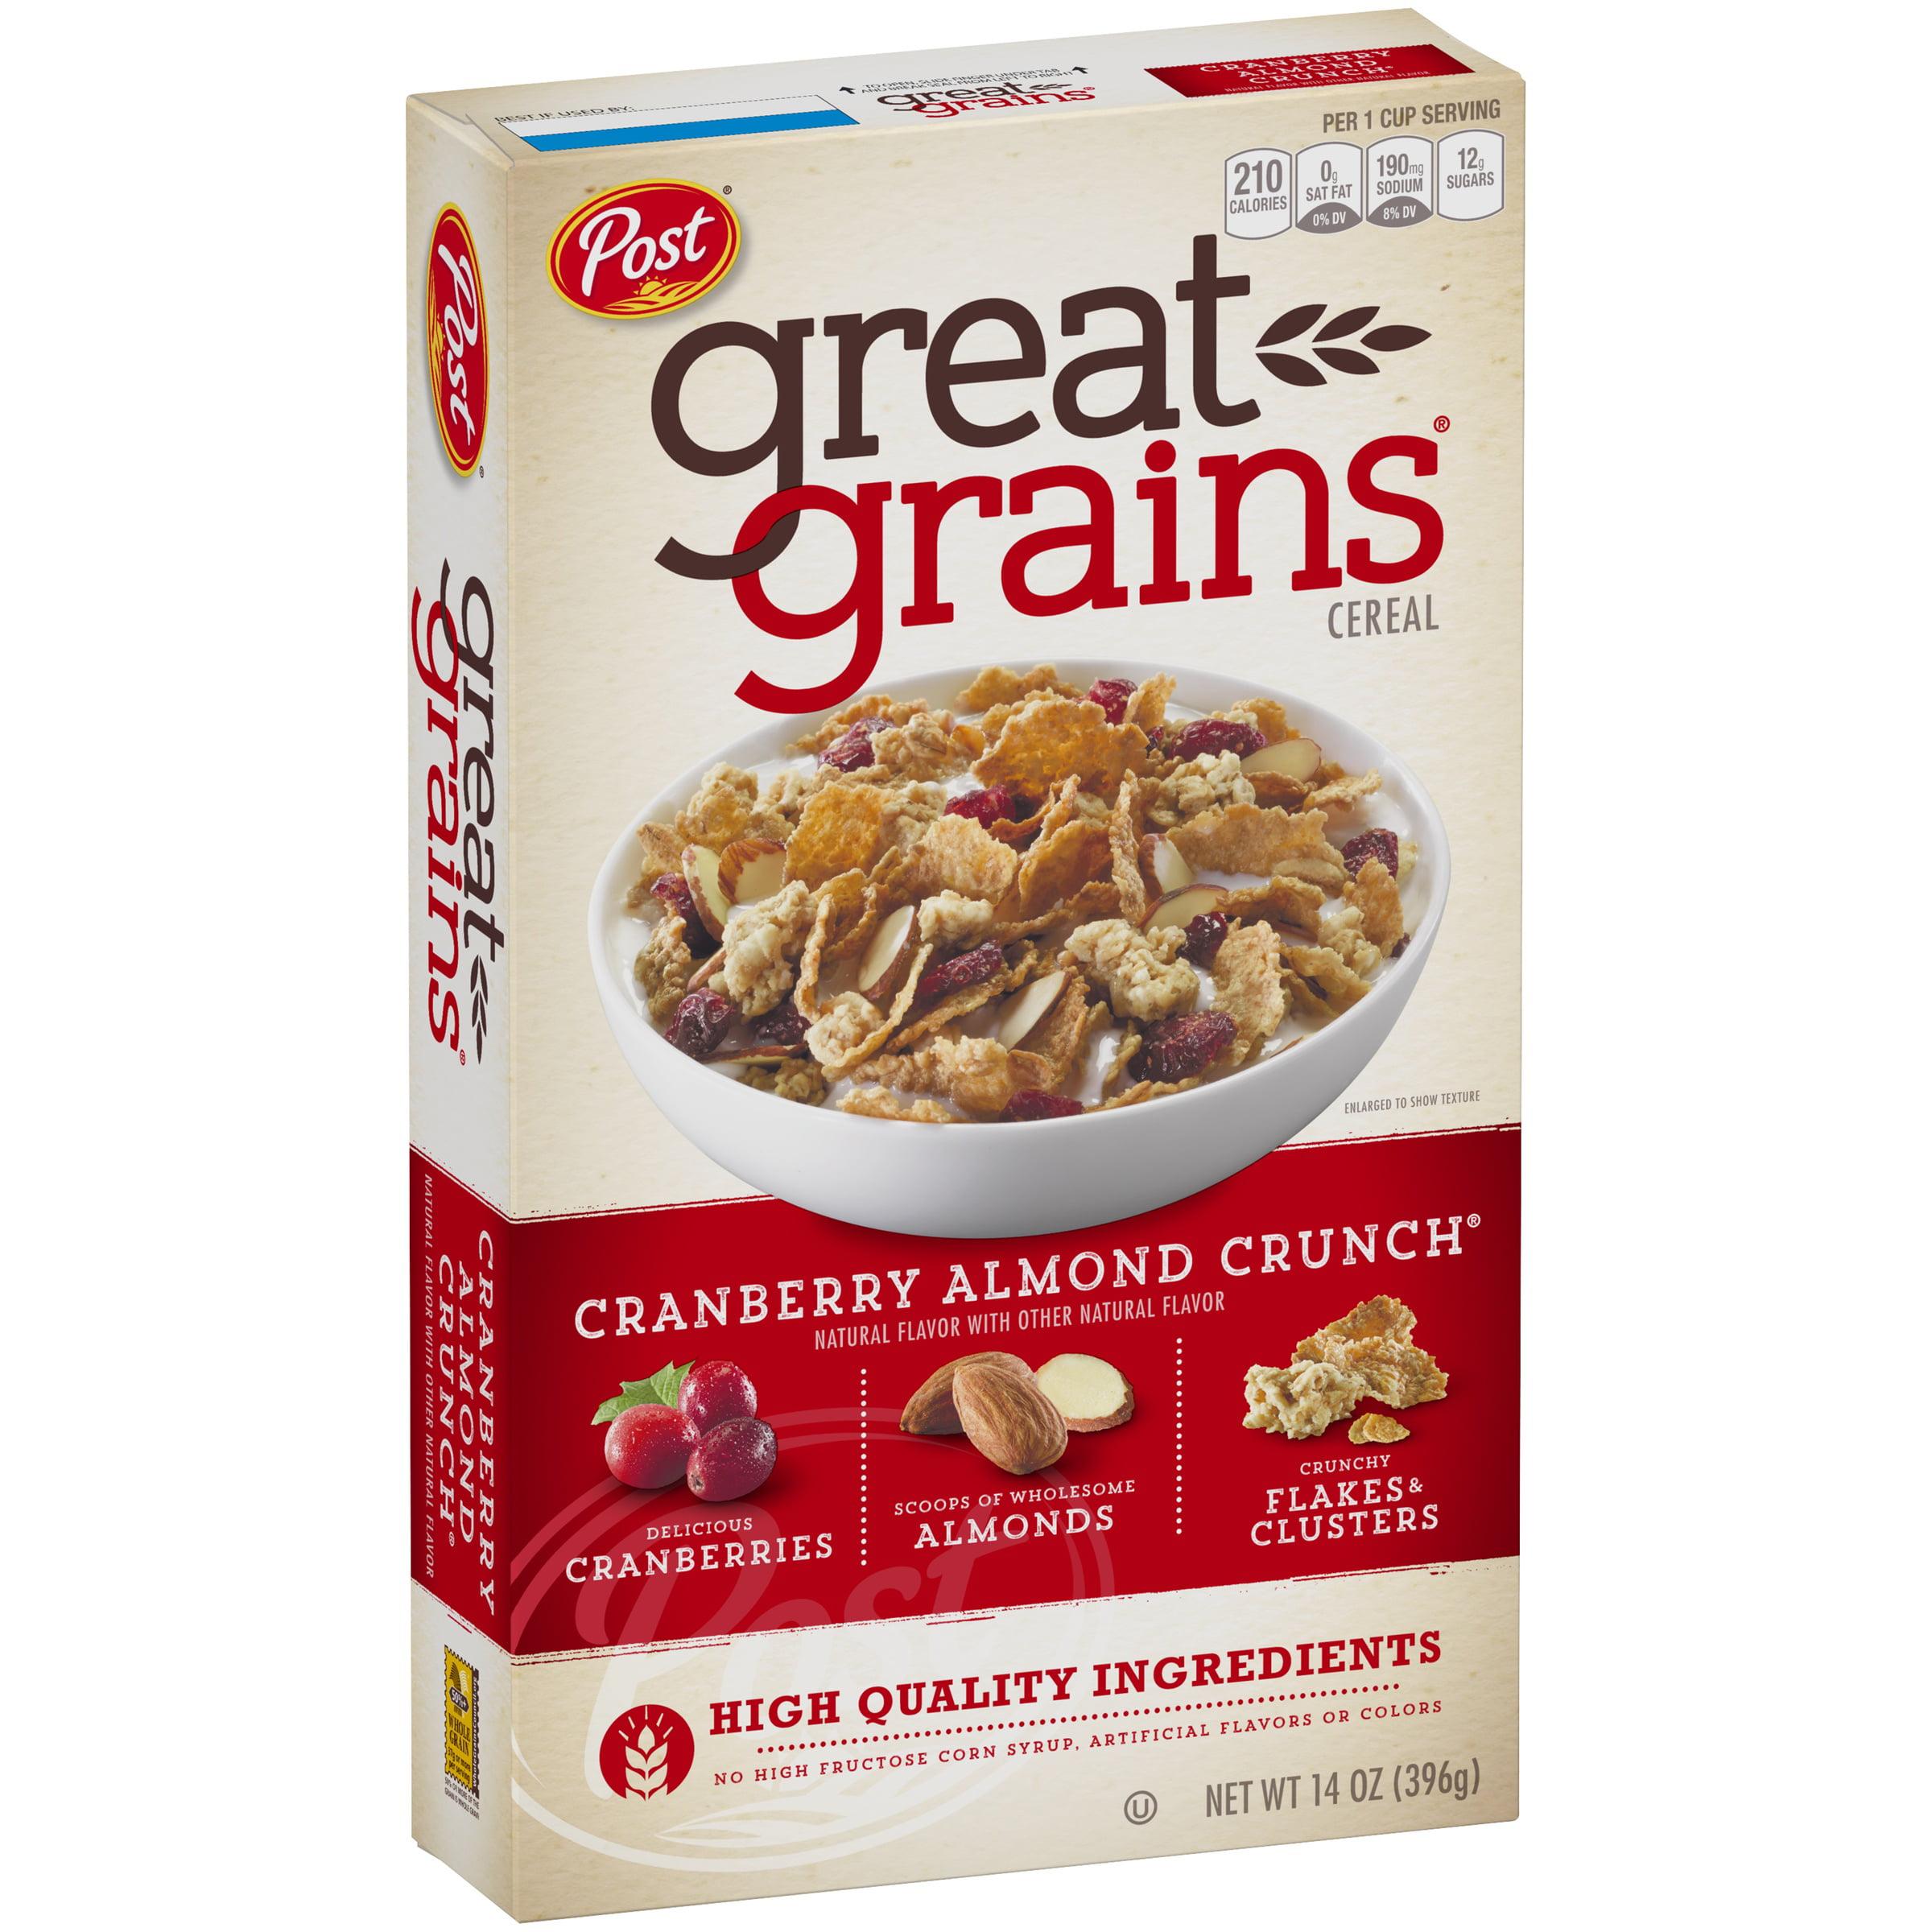 Post Great Grains Cranberry Almond Crunch Whole Grain Cereal 14 oz. Box